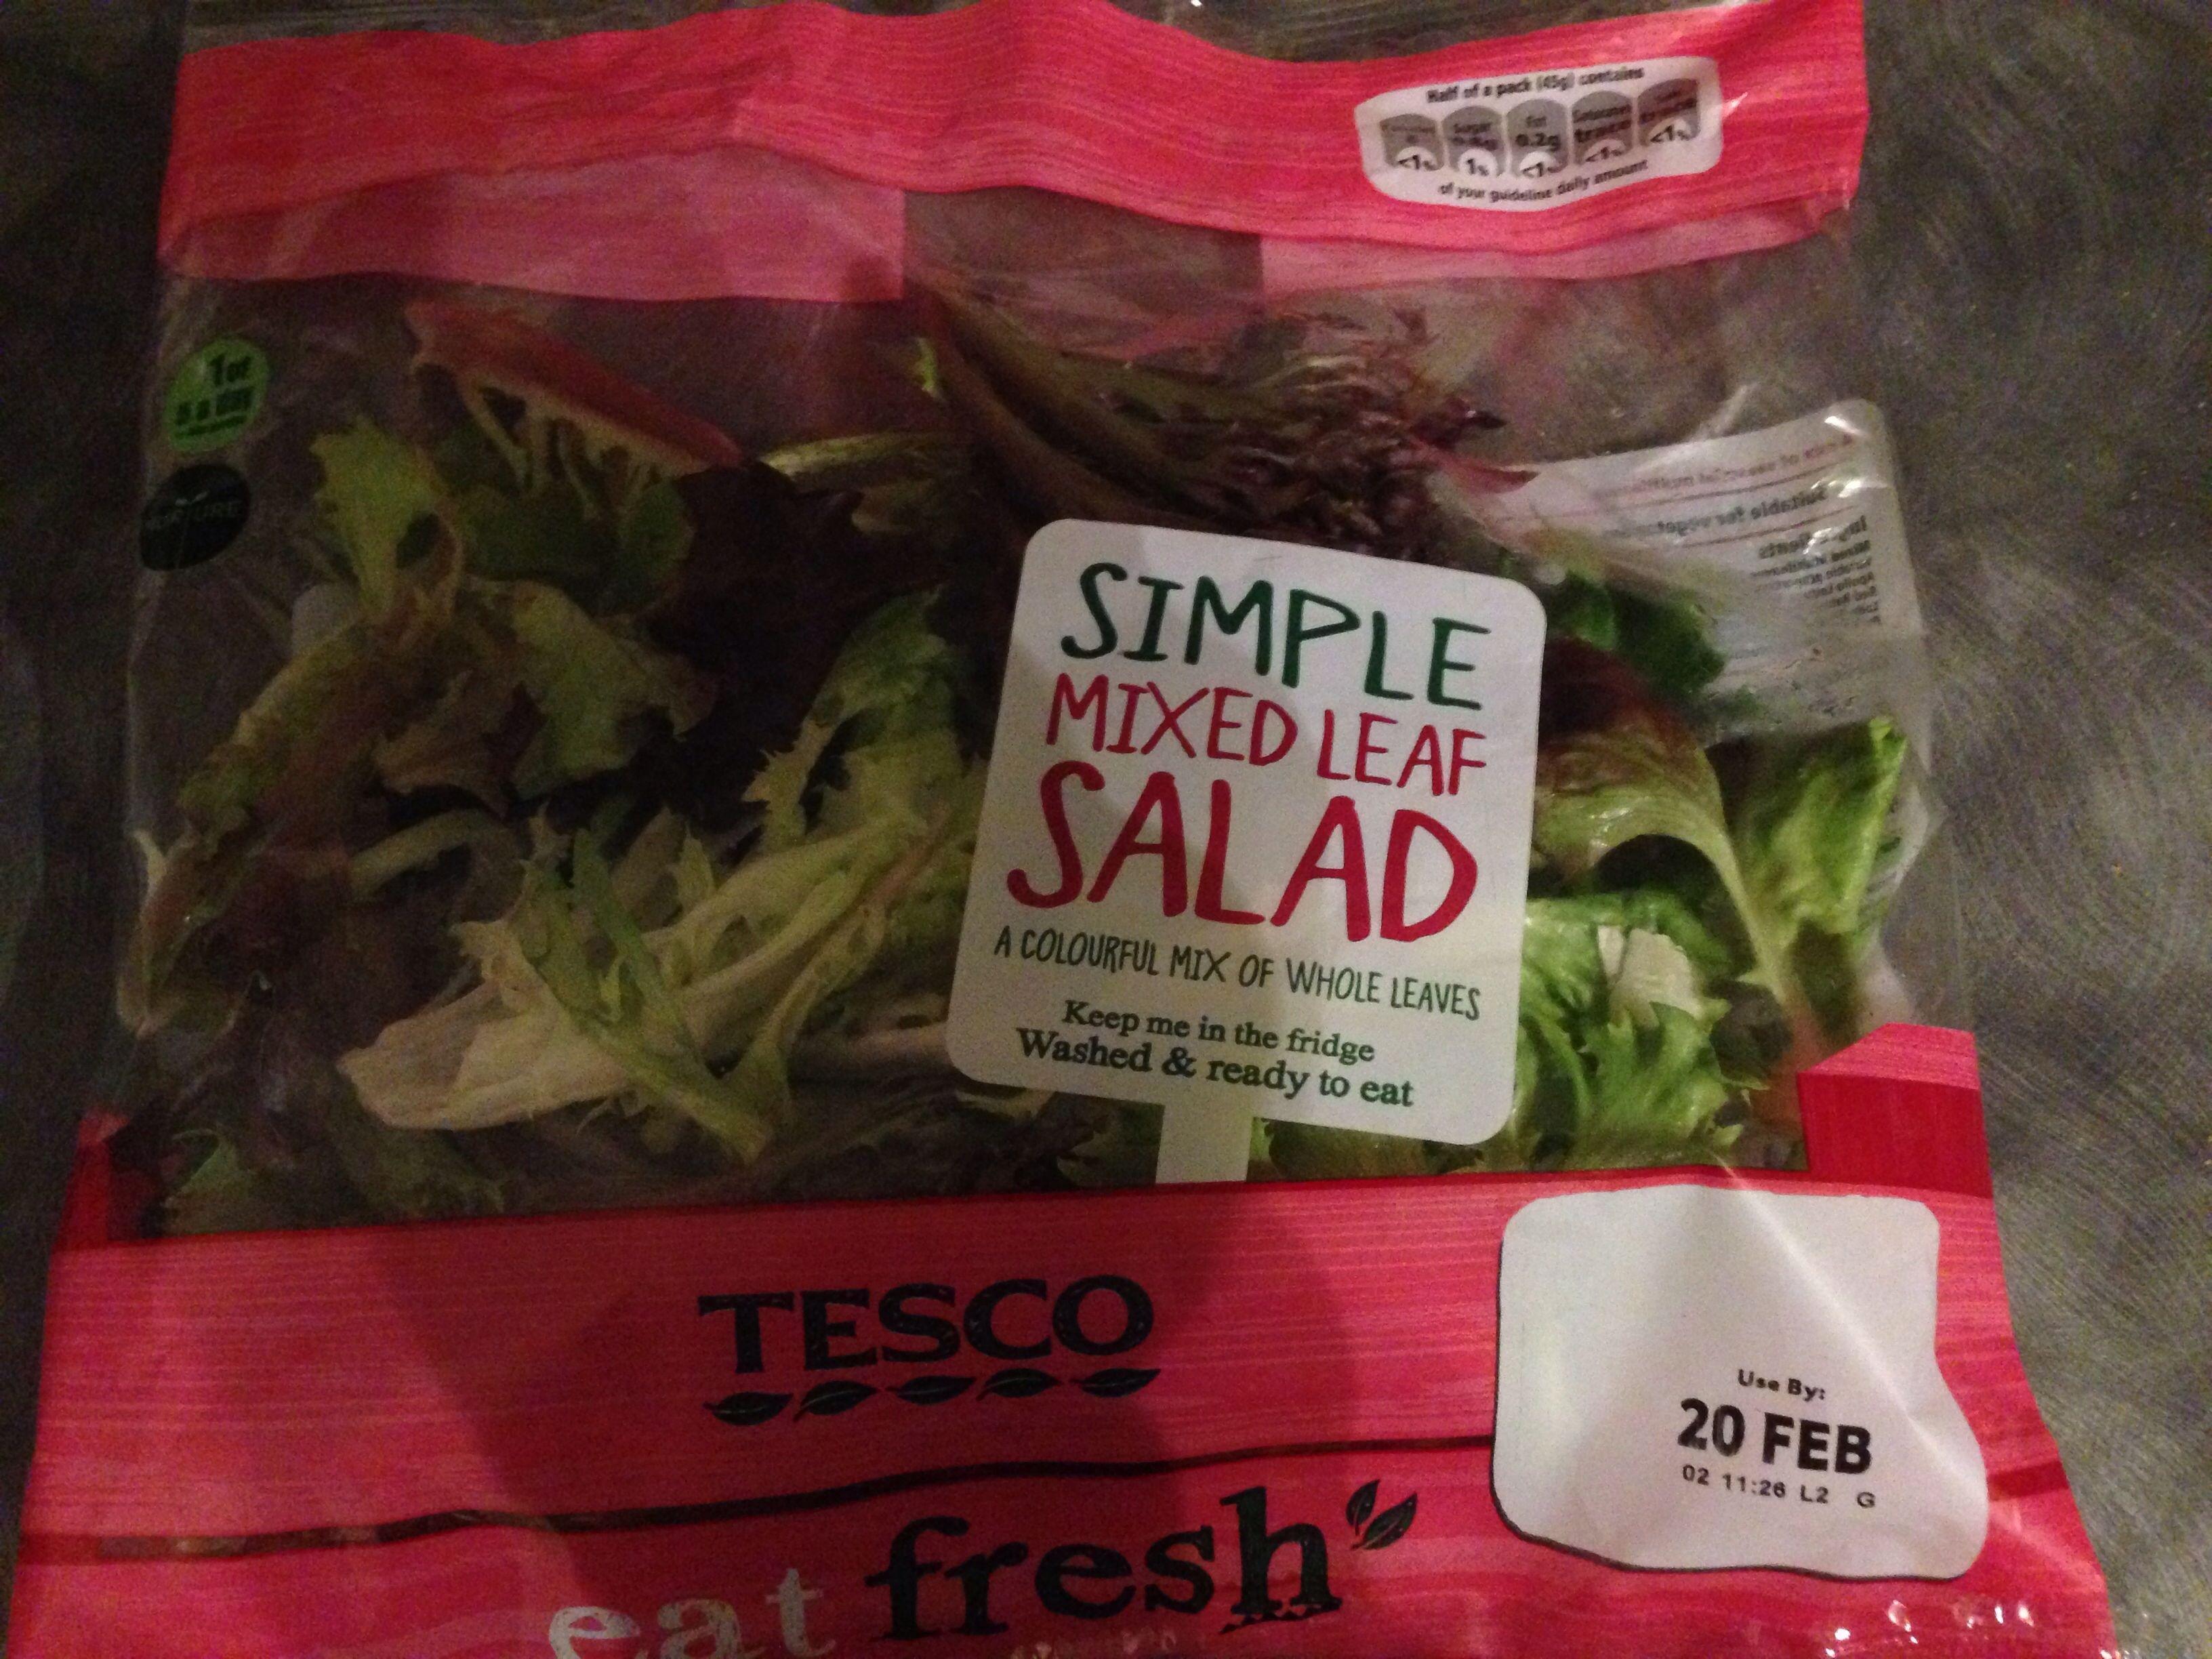 Simple mixed leaf salad - Product